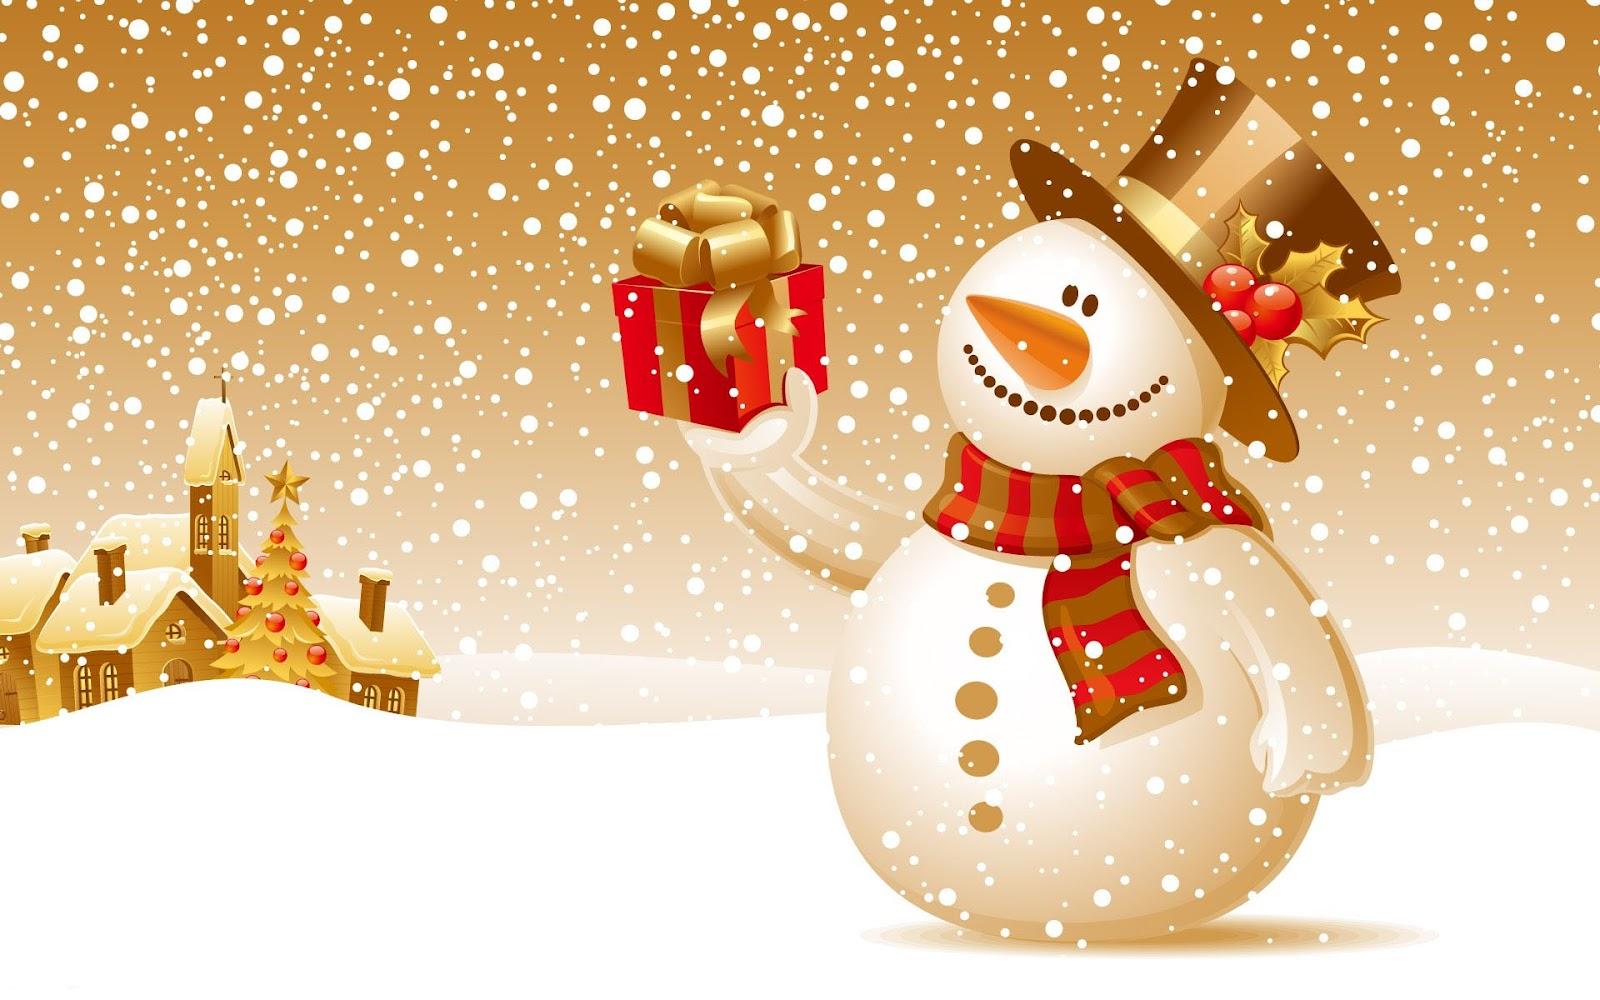 Christmas Wallpaper Snowman Free Downloads